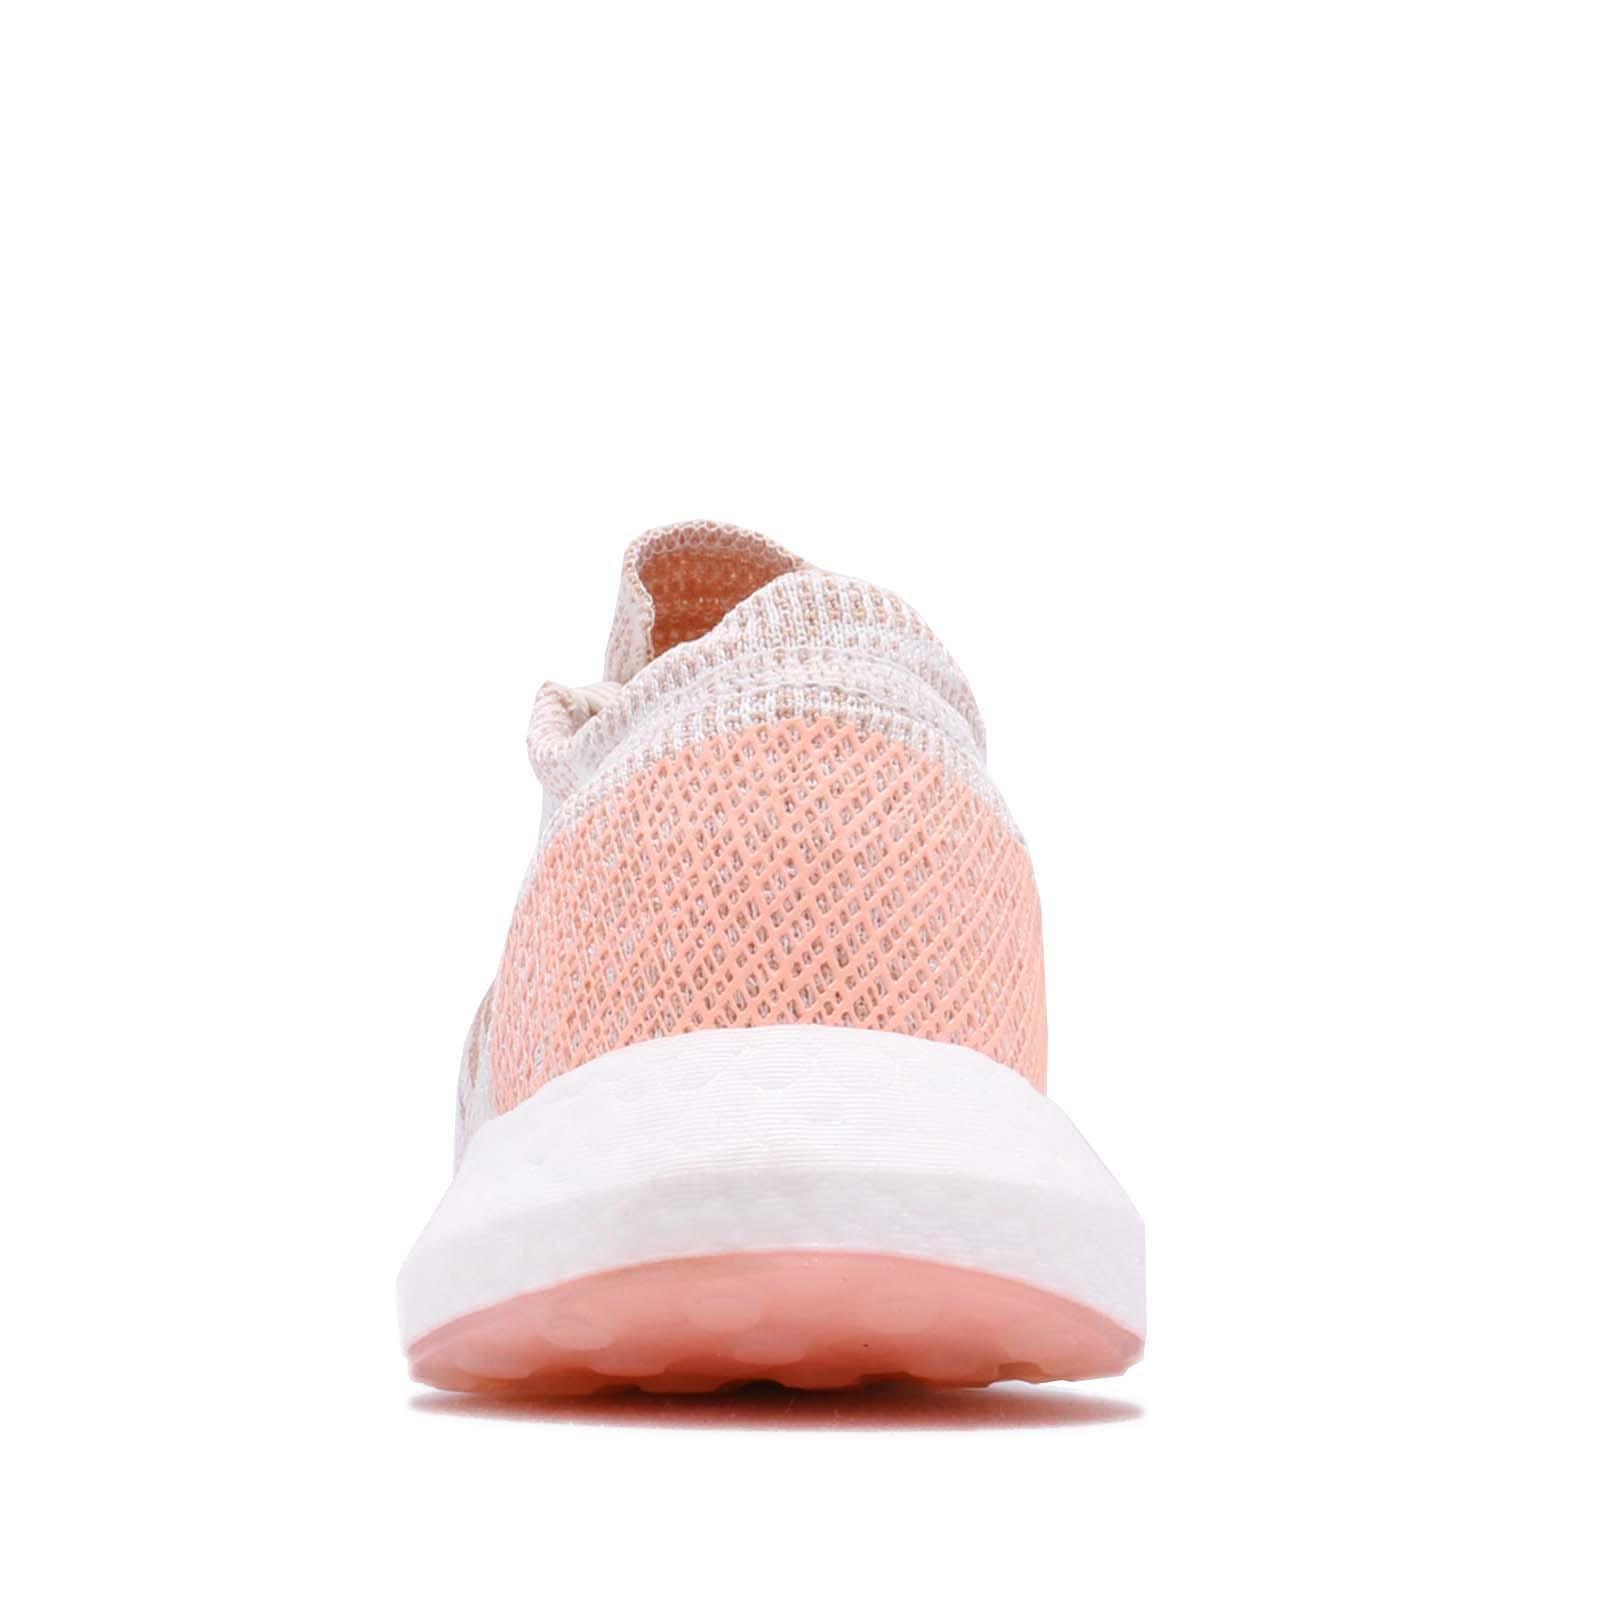 900681eee adidas PureBOOST GO W Pink Orange White Women Running Shoes Sneakers ...